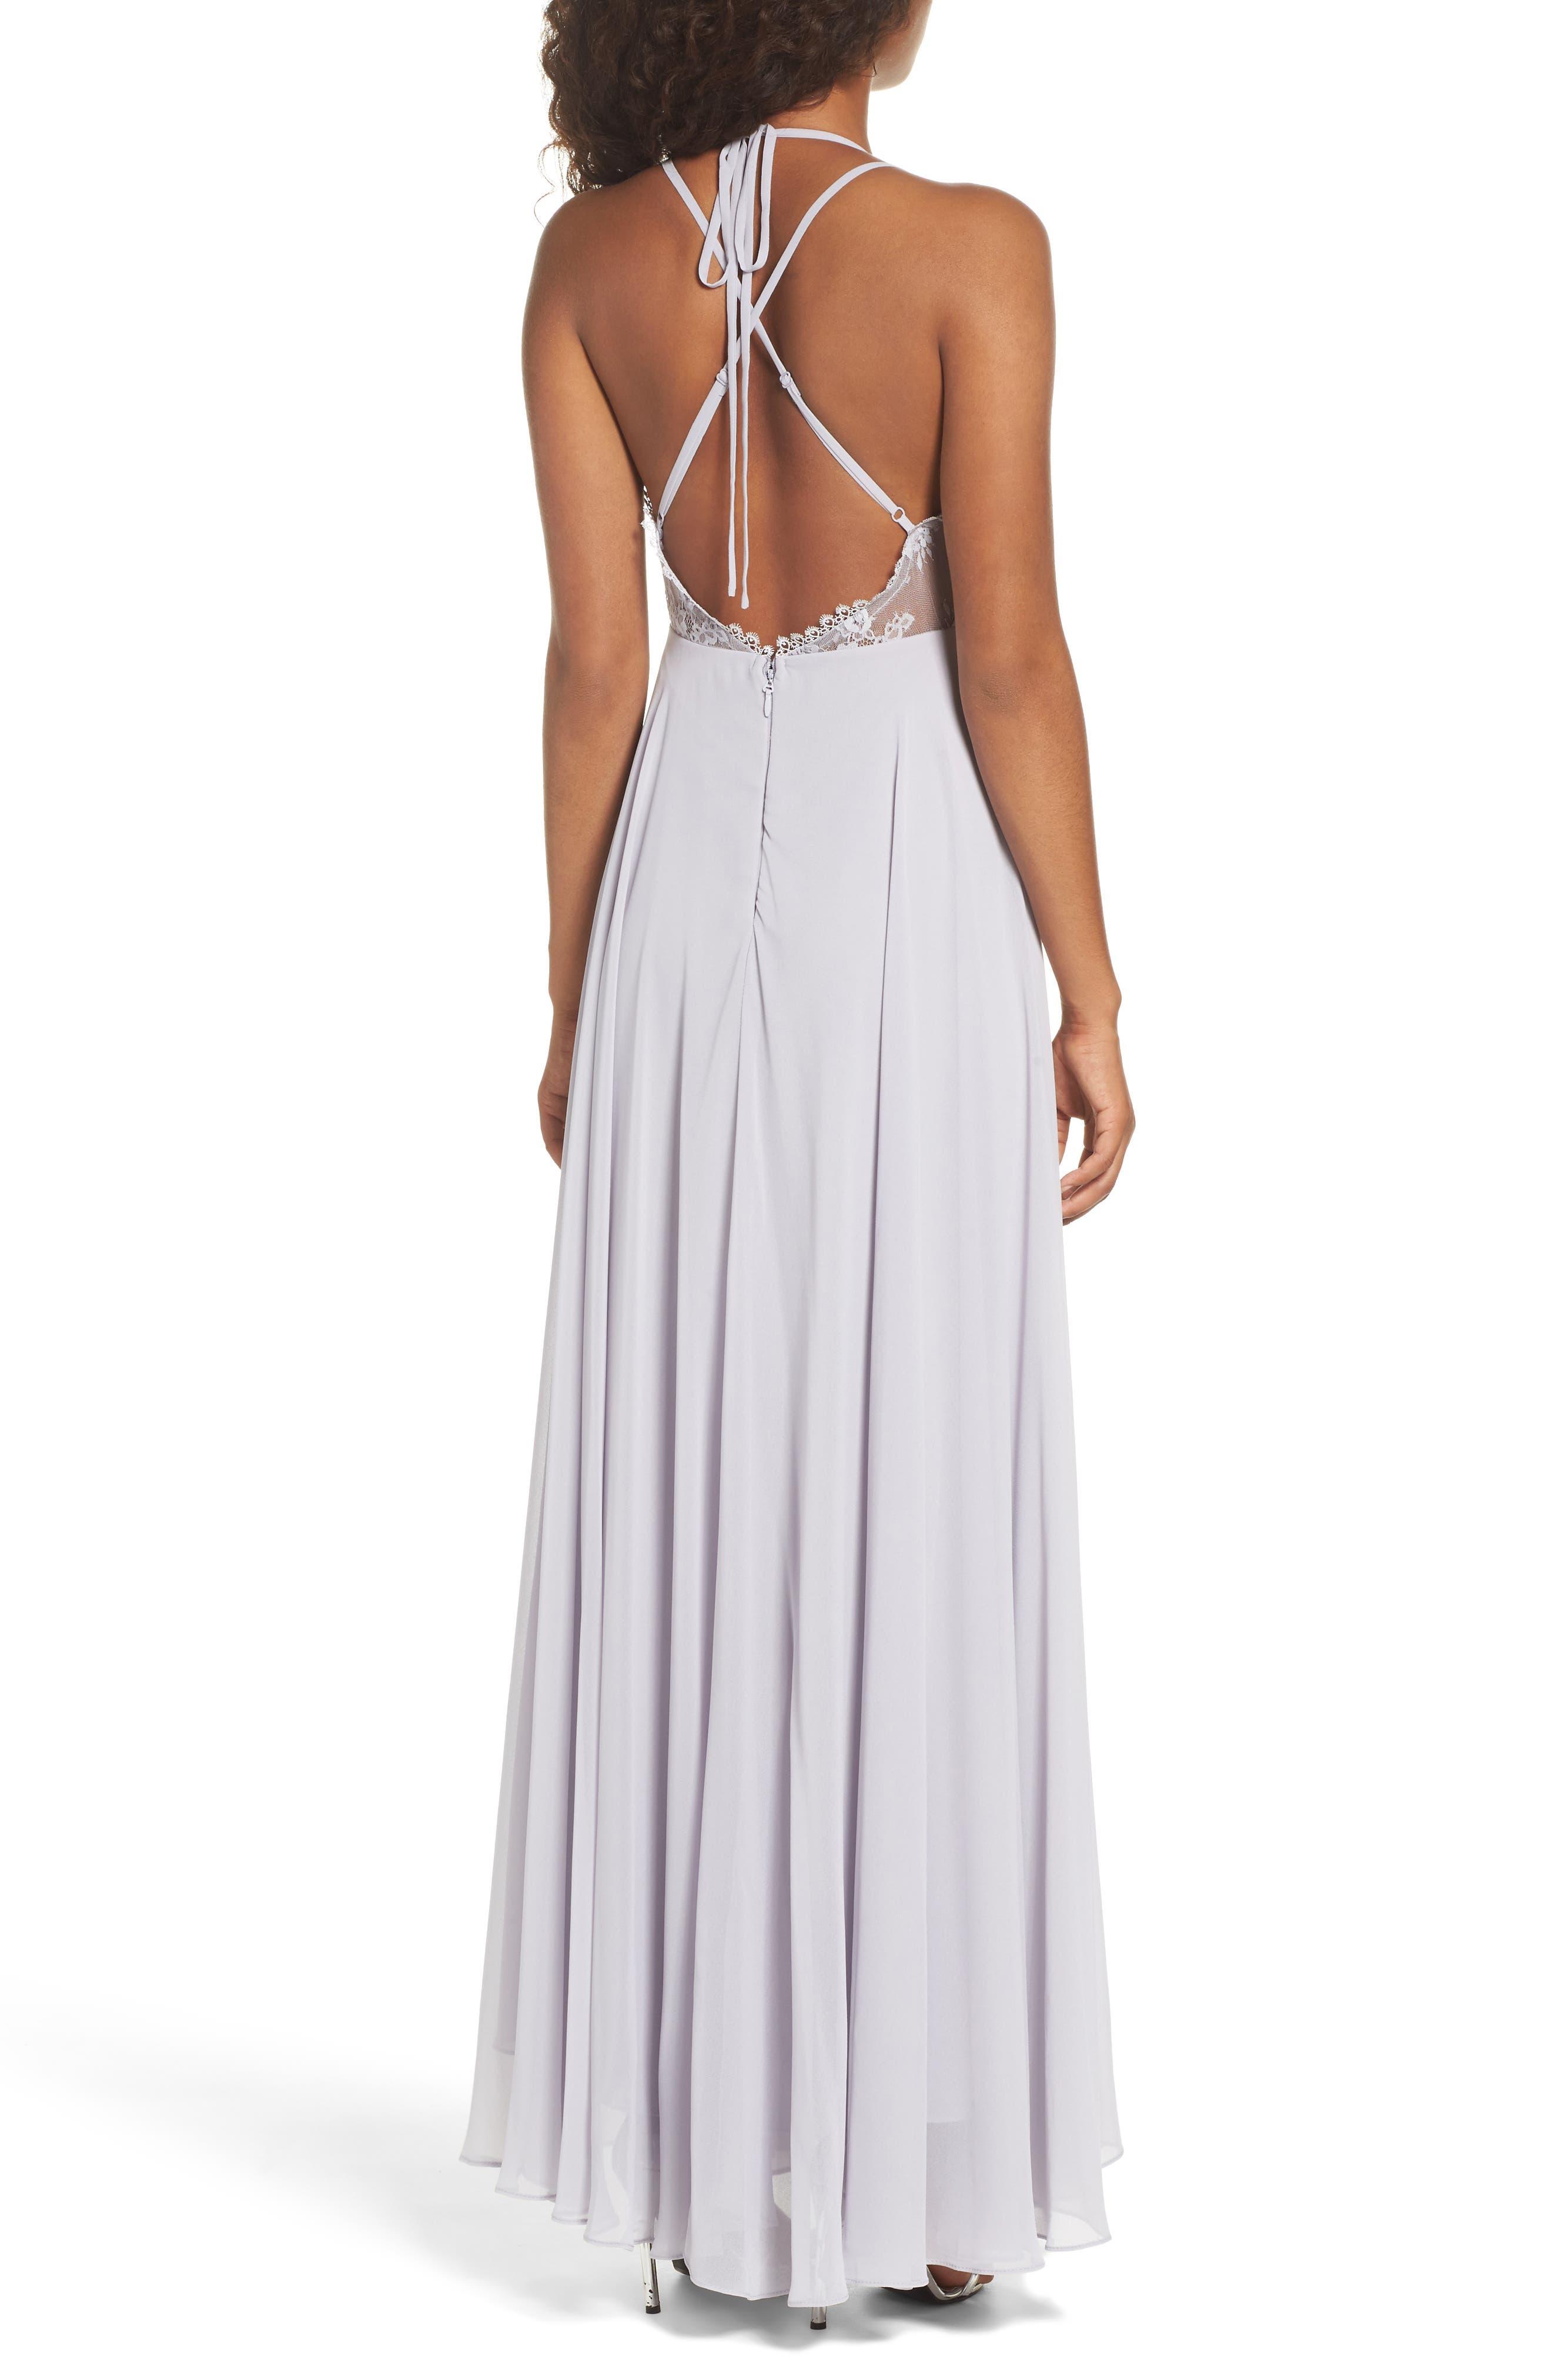 Celebrate the Moment Lace Trim Chiffon Maxi Dress,                             Alternate thumbnail 2, color,                             020